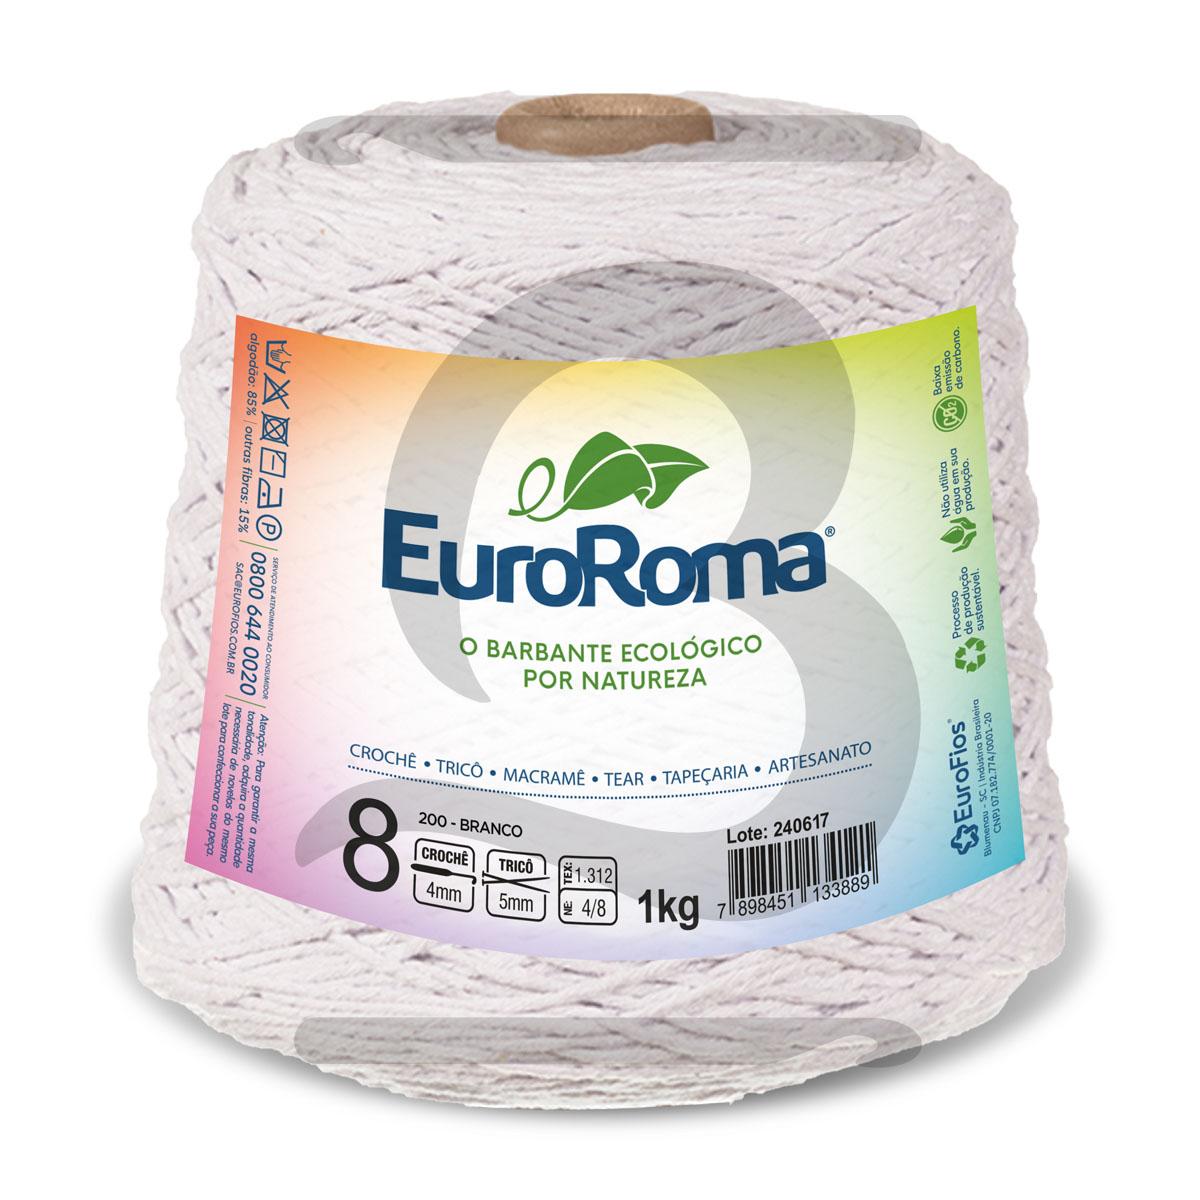 Barbante EuroRoma Colorido N°8 - 1kg Cor 200 Branco